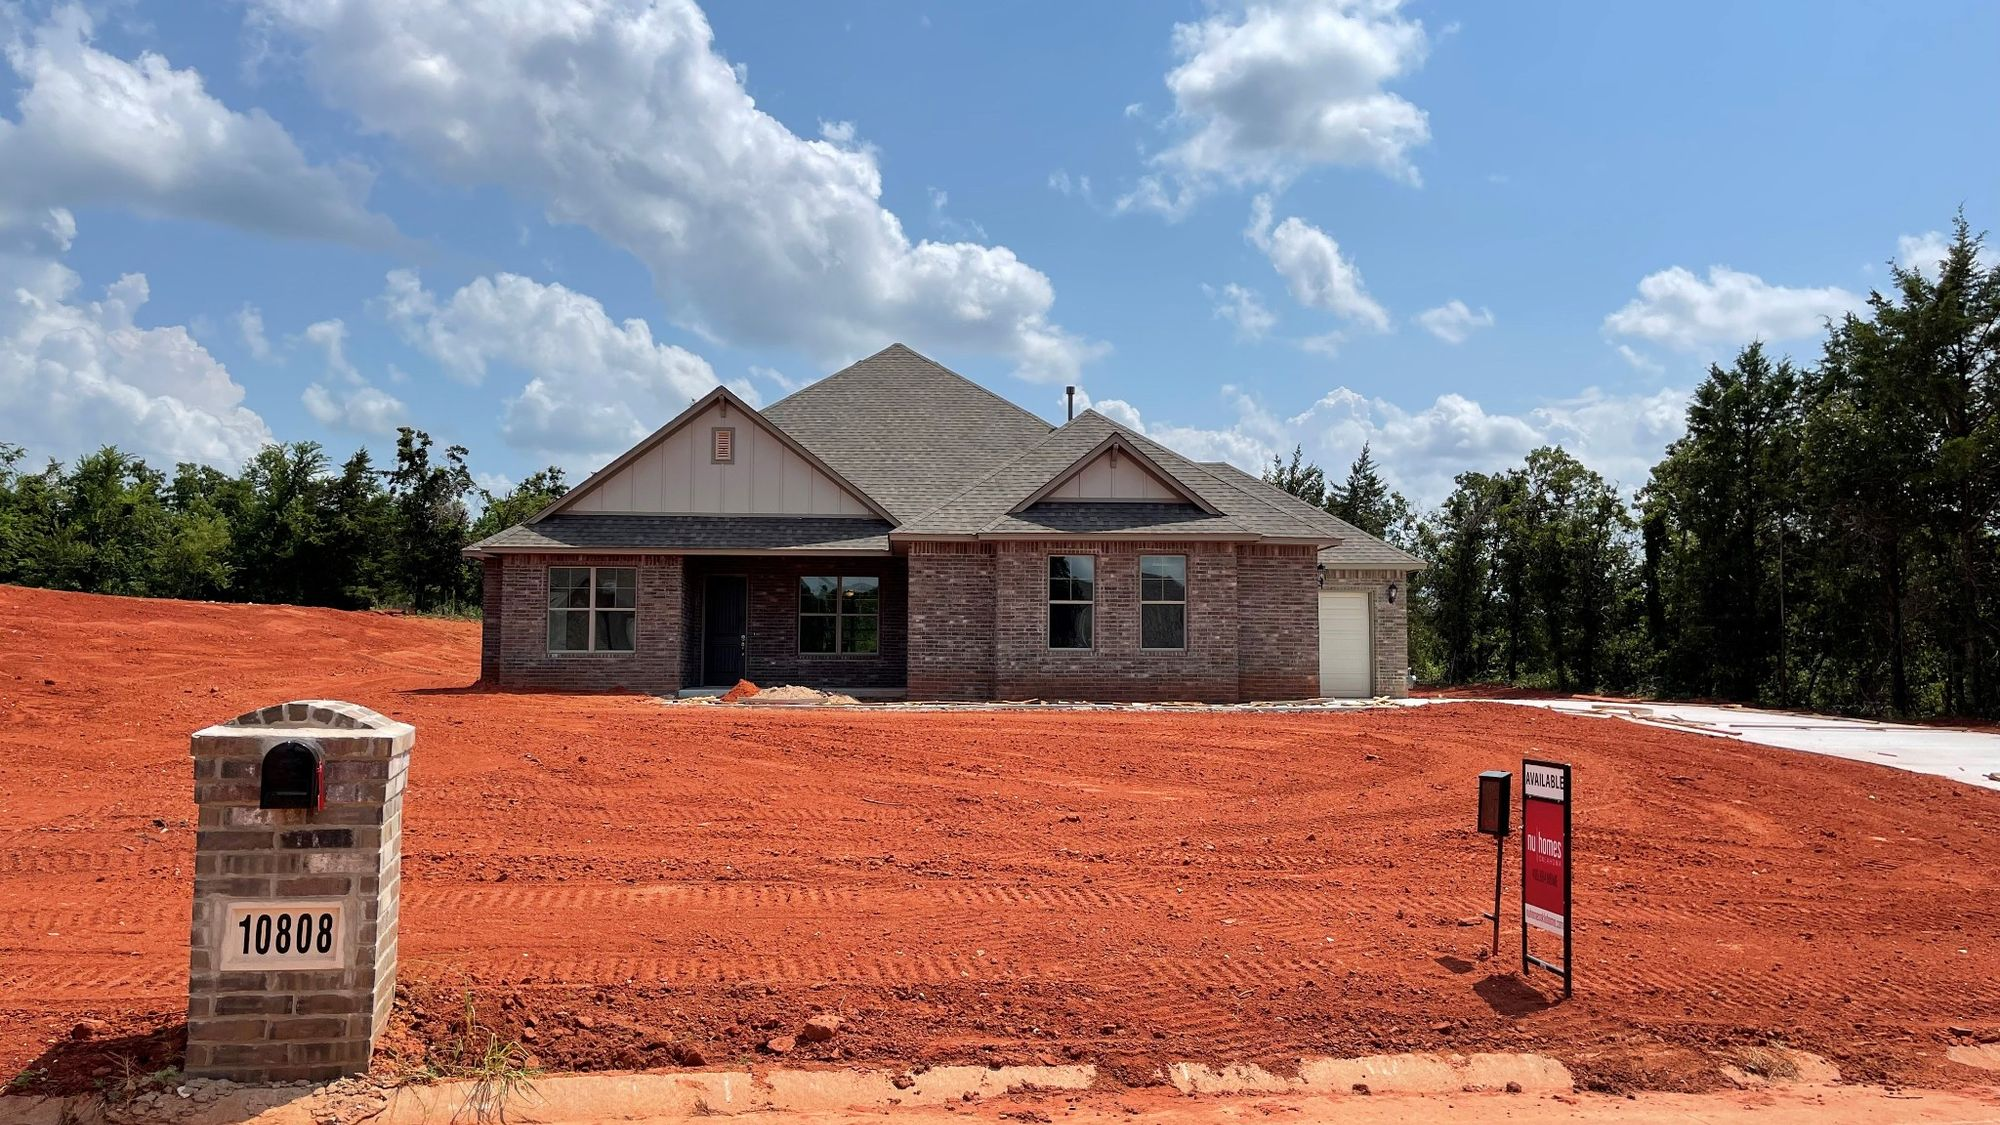 Homebuilder in OKC, Close to Tinker, Close to Boeing, Acre lot, Oklahoma Home Builder, Oklahoma Builder,